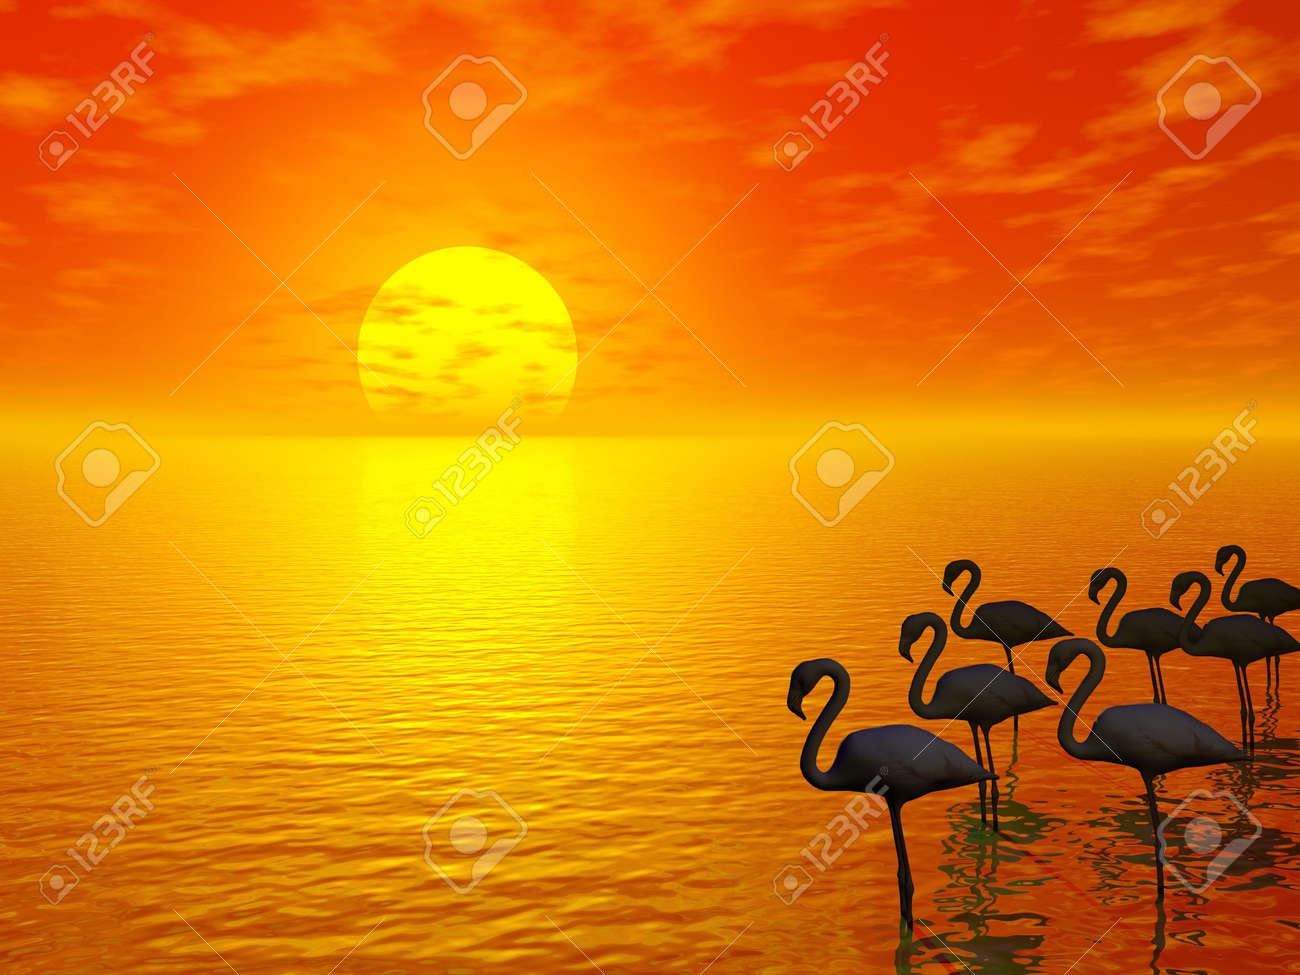 orange sunset and flamingos silhouettes Stock Photo - 845207